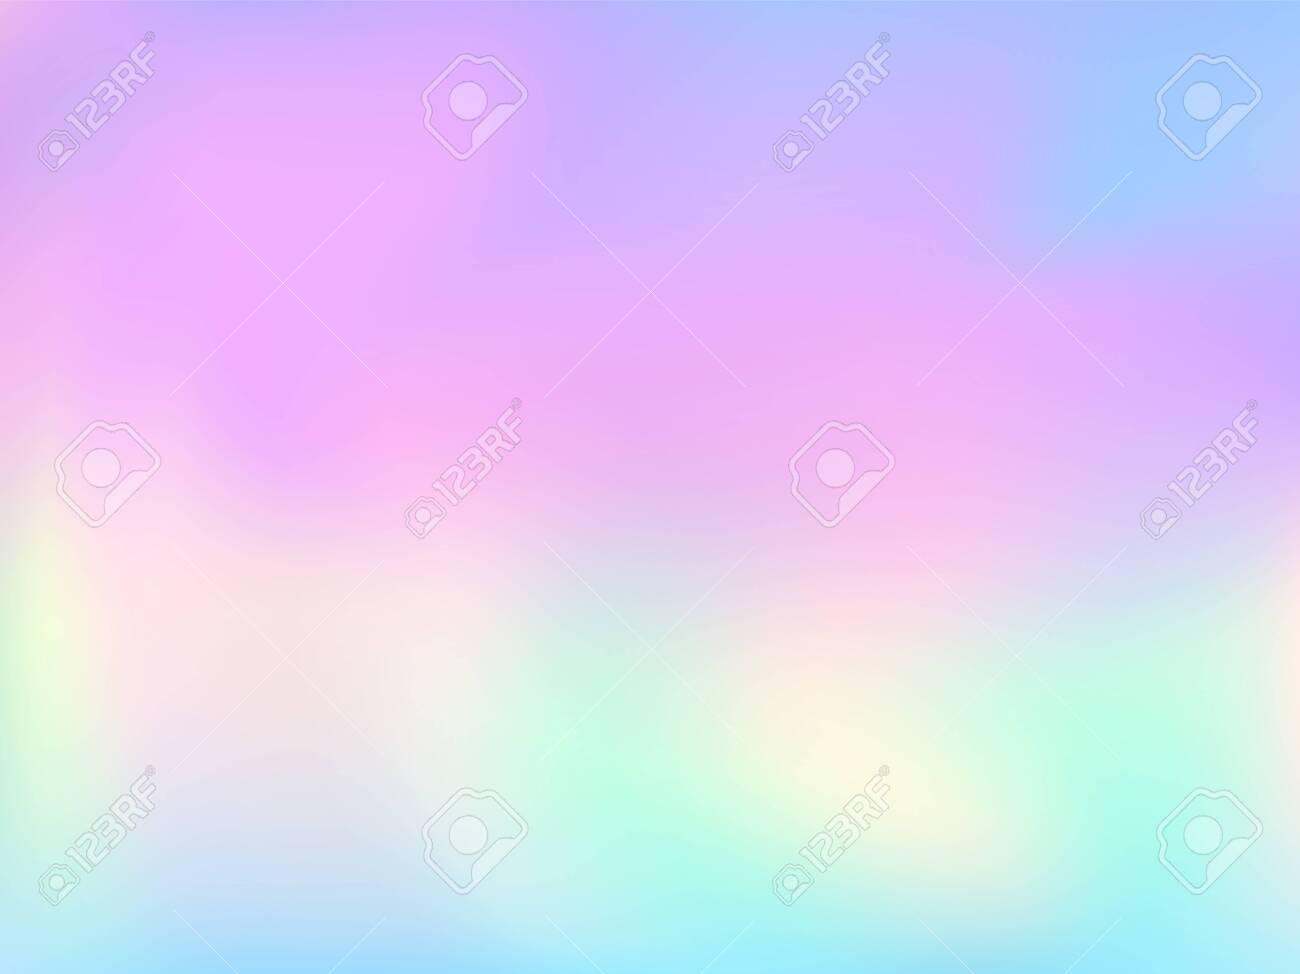 Blurred Hologram Texture Gradient Wallpaper Elegant Pastel Rainbow